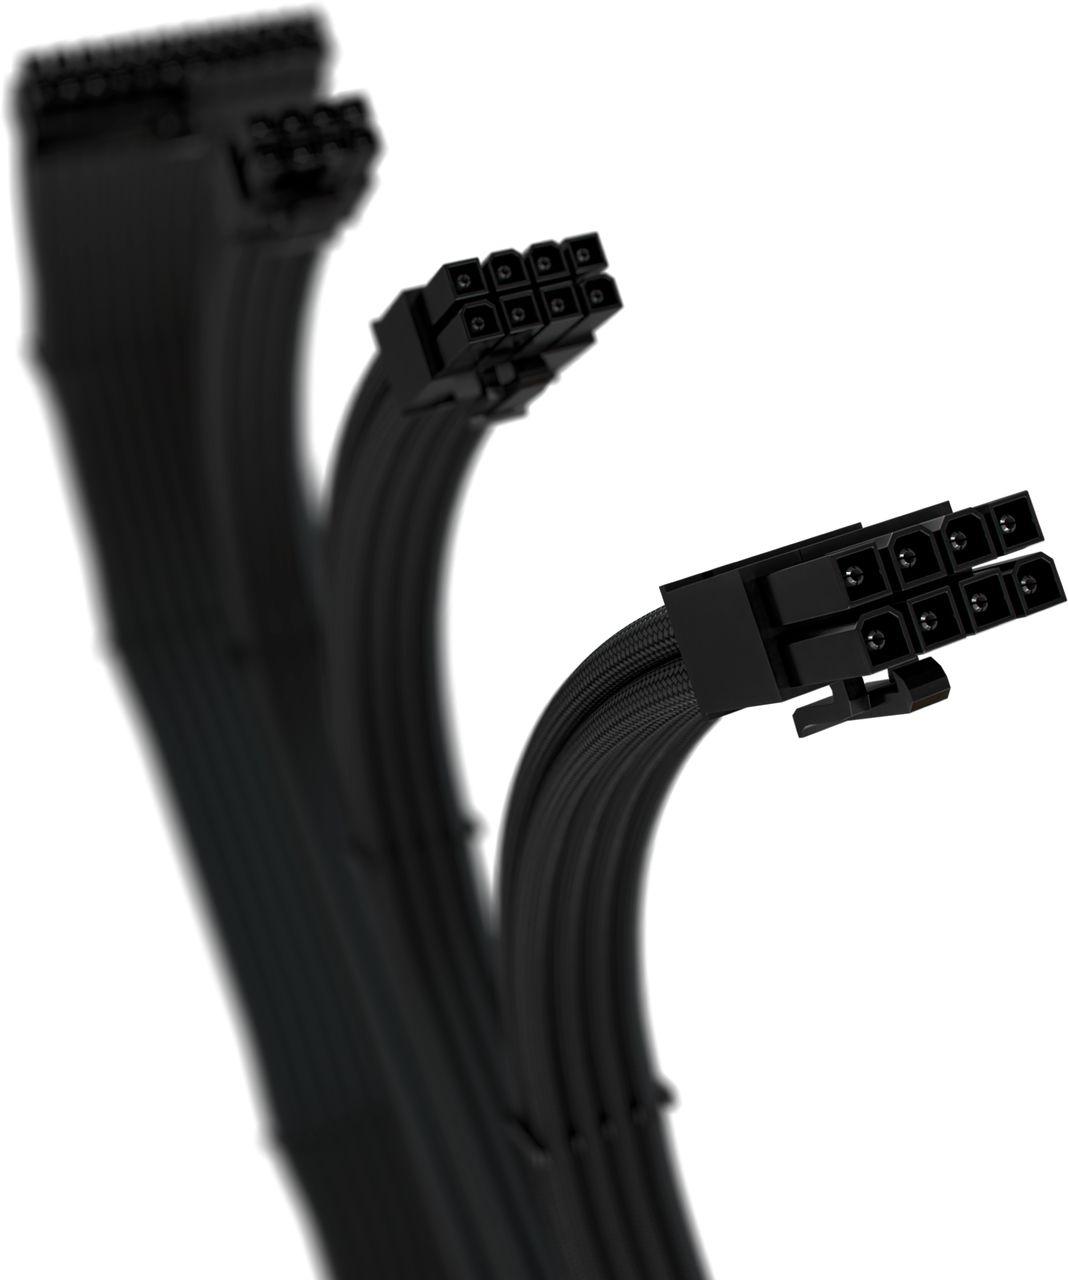 Cabos Sleeved Gamer Rise Mode Kit 4  - Loja Rise Mode